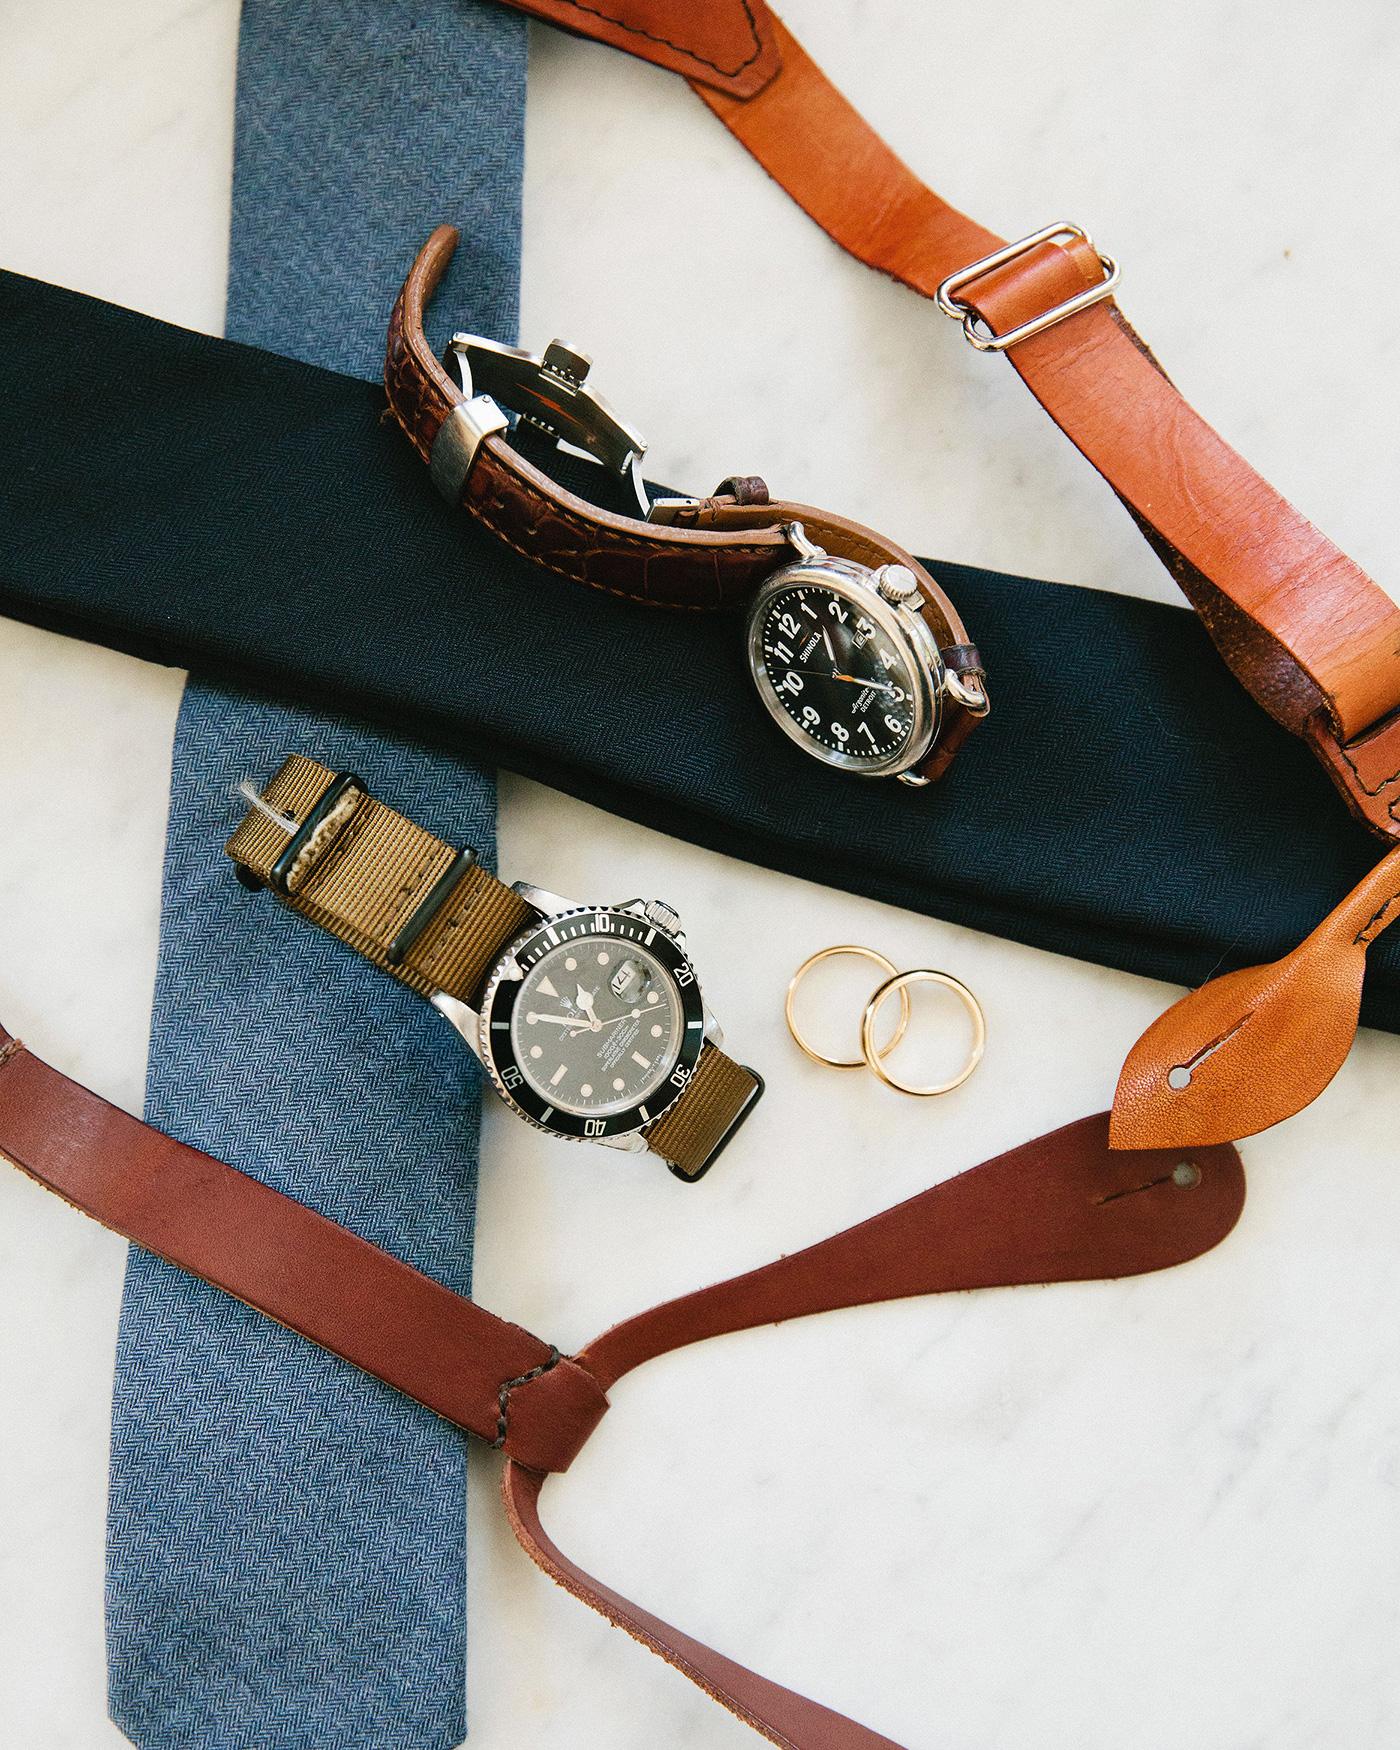 jesse-nate-wedding-accessories-0184-s113063-0716.jpg